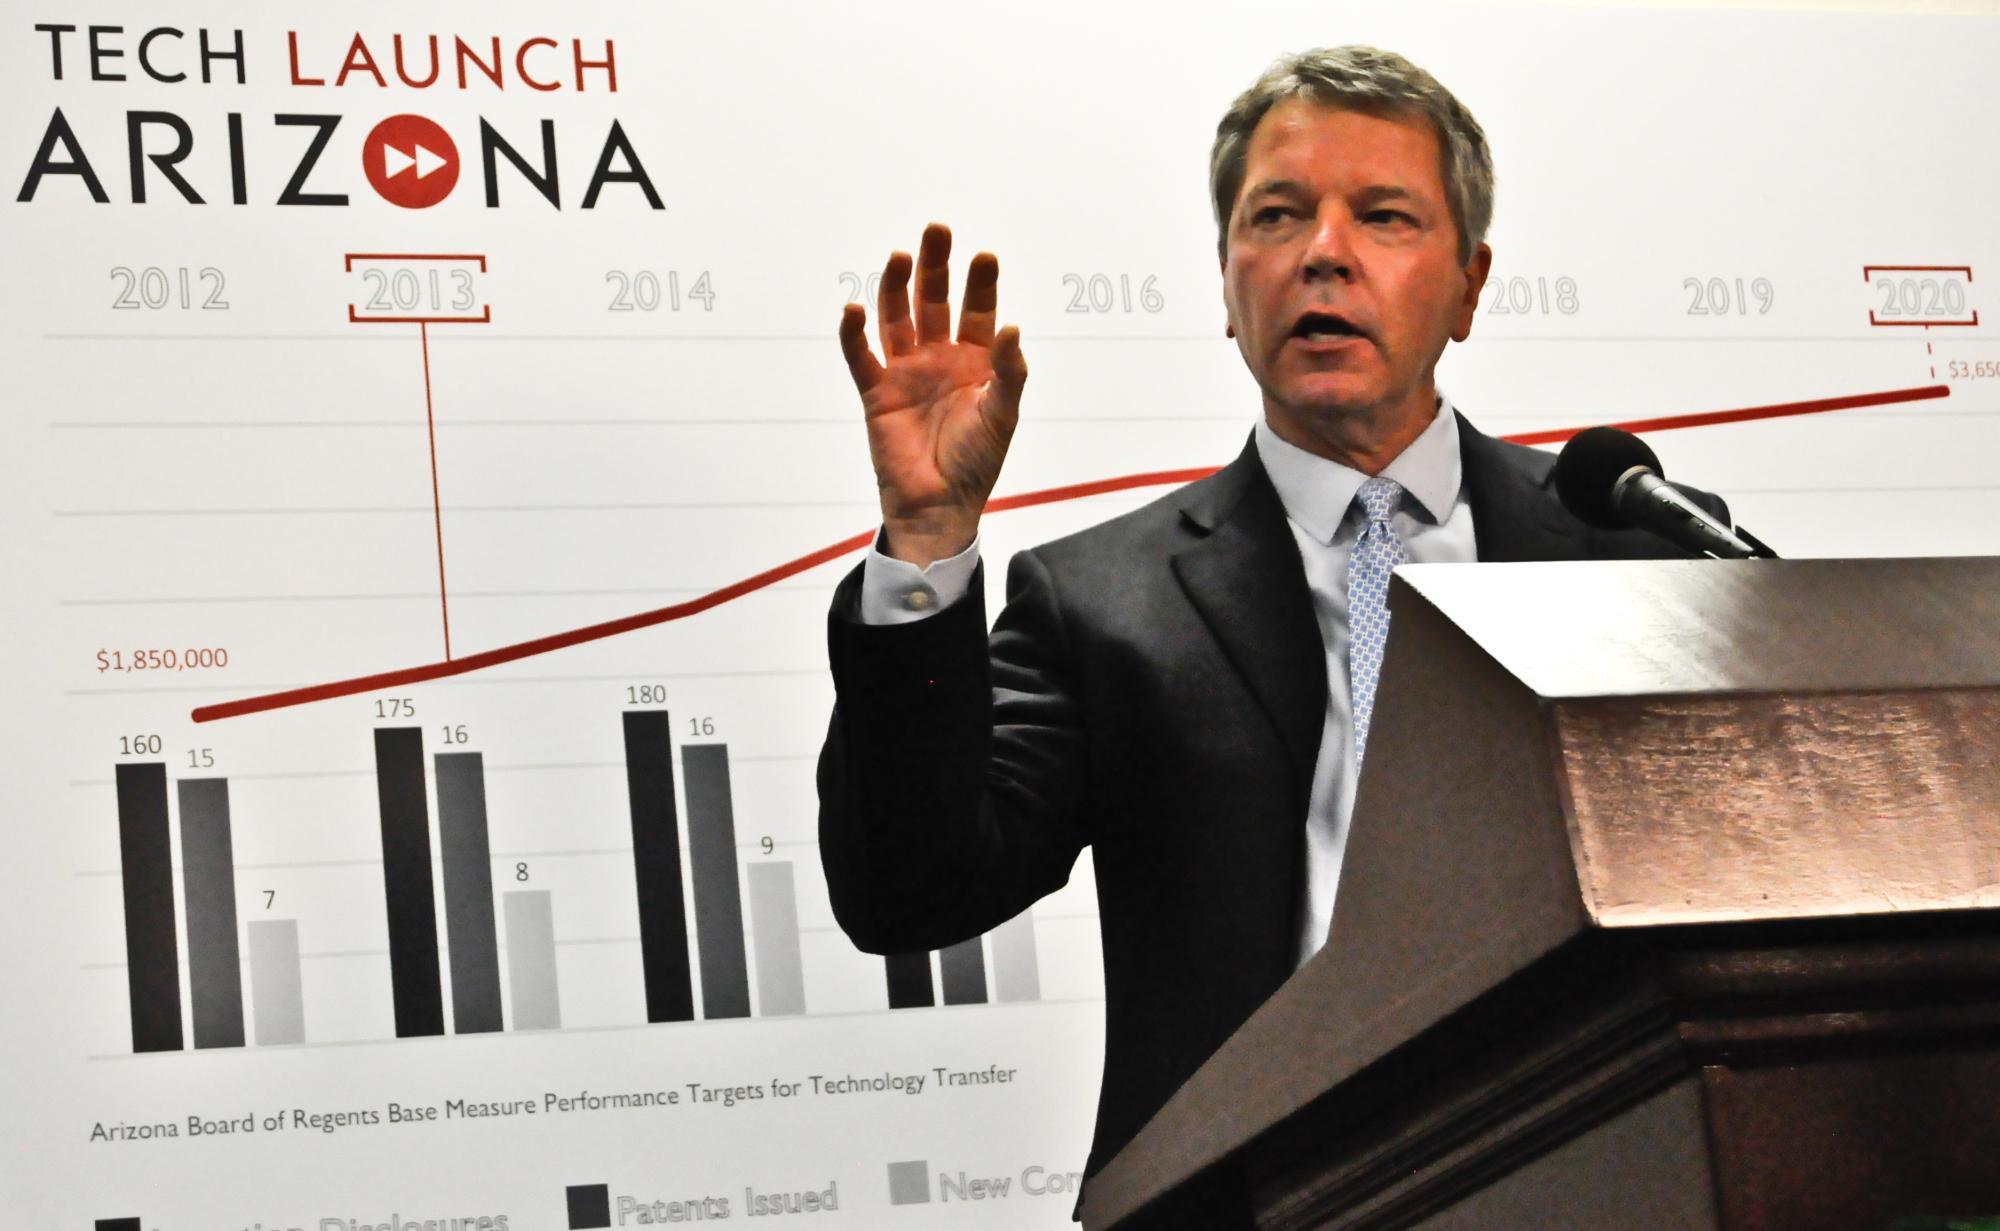 David Allen, Tech Launch Arizona executive director